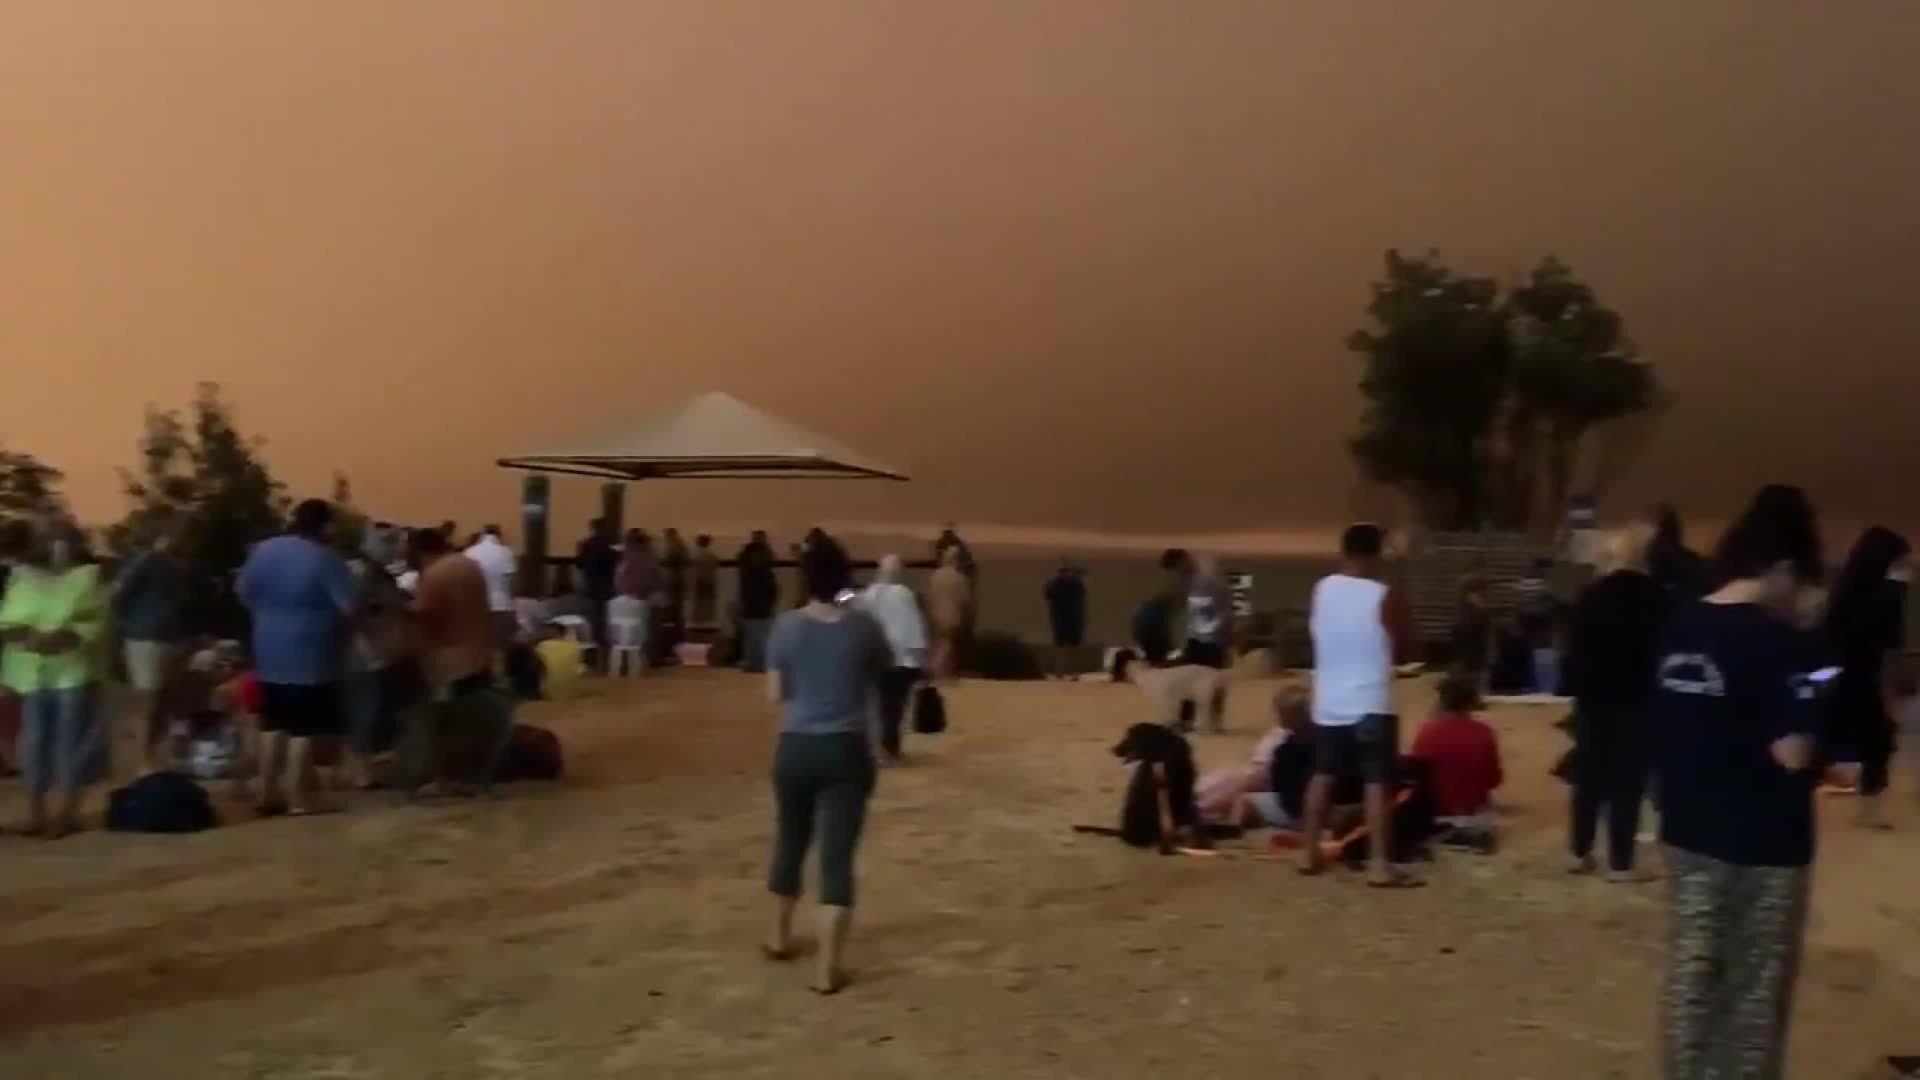 Photos: An Australian comedian has raised more than $26 million to fight deadlybushfires